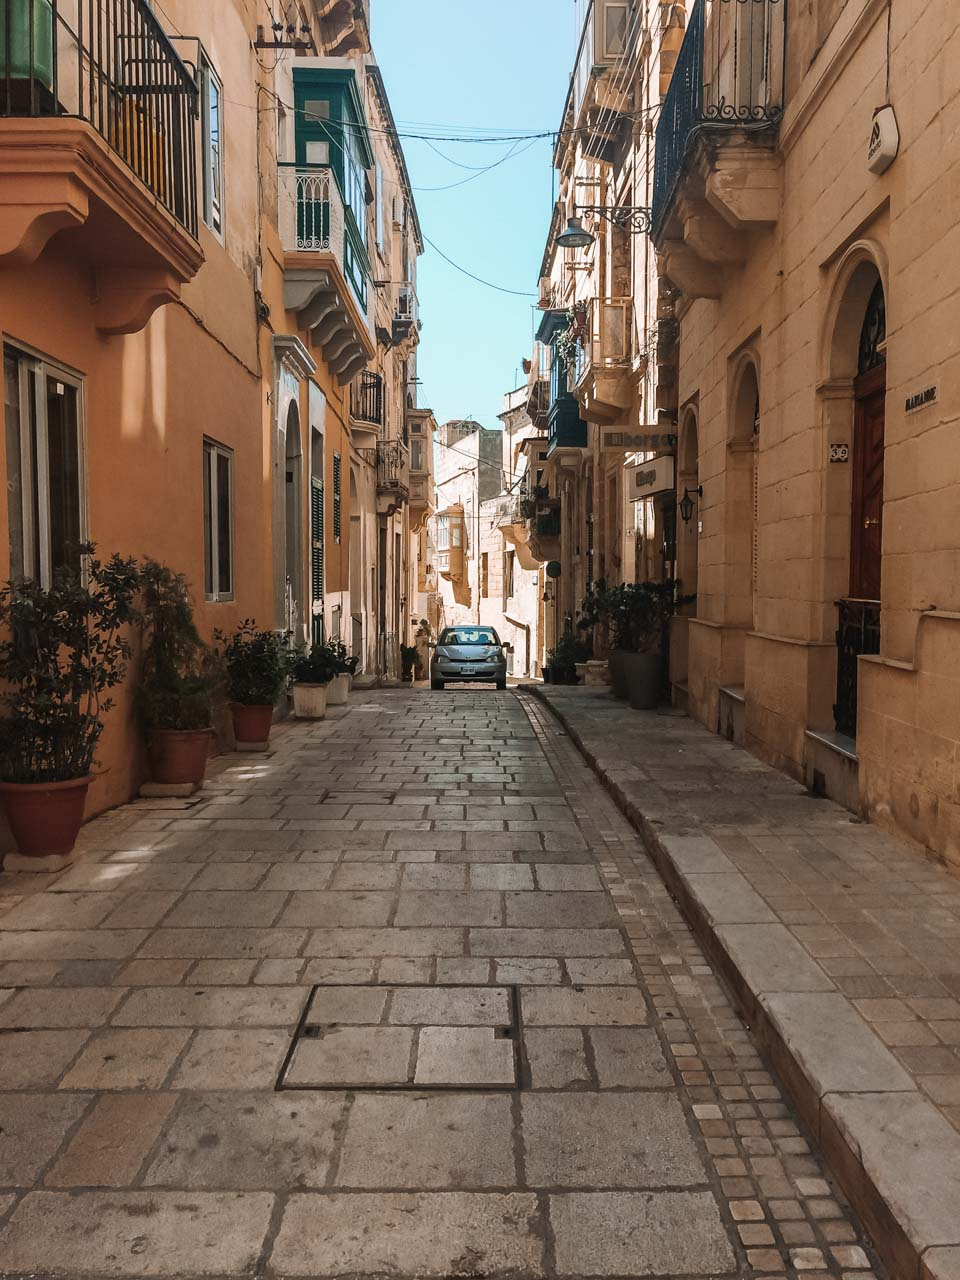 A car driving in a traditional alley in Birgu, Malta